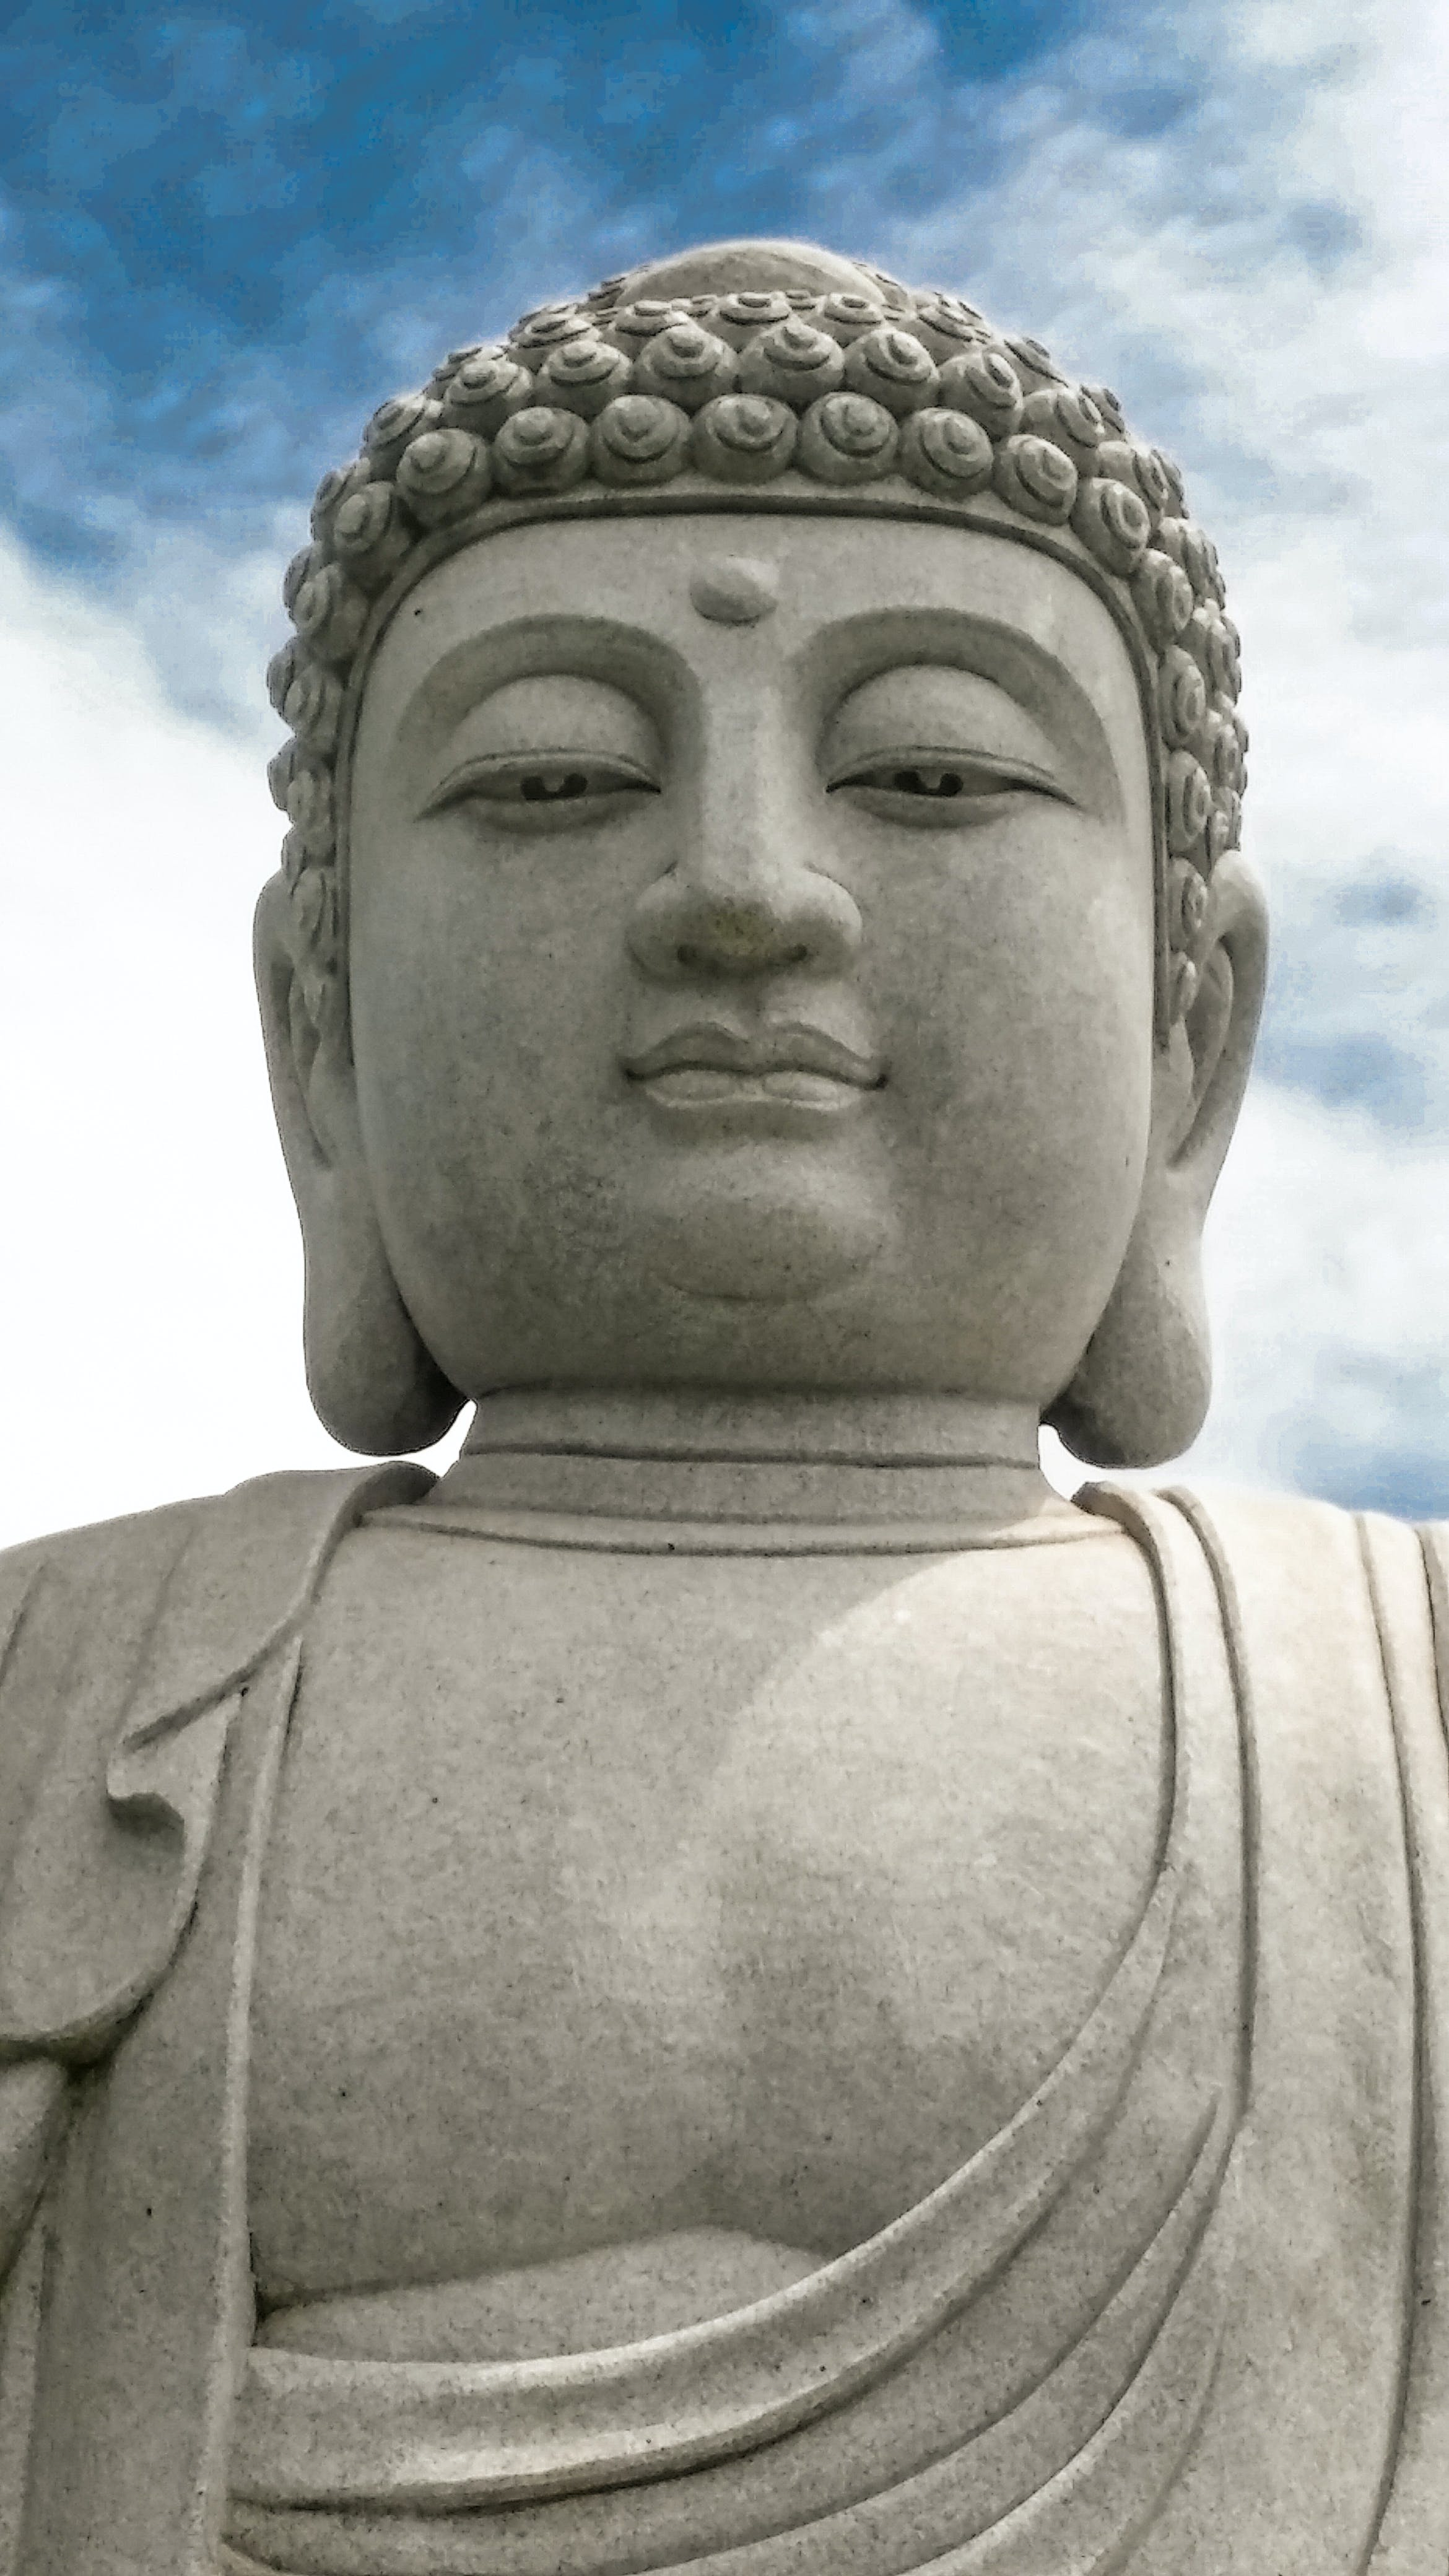 Buddha Statue Under White Clouds